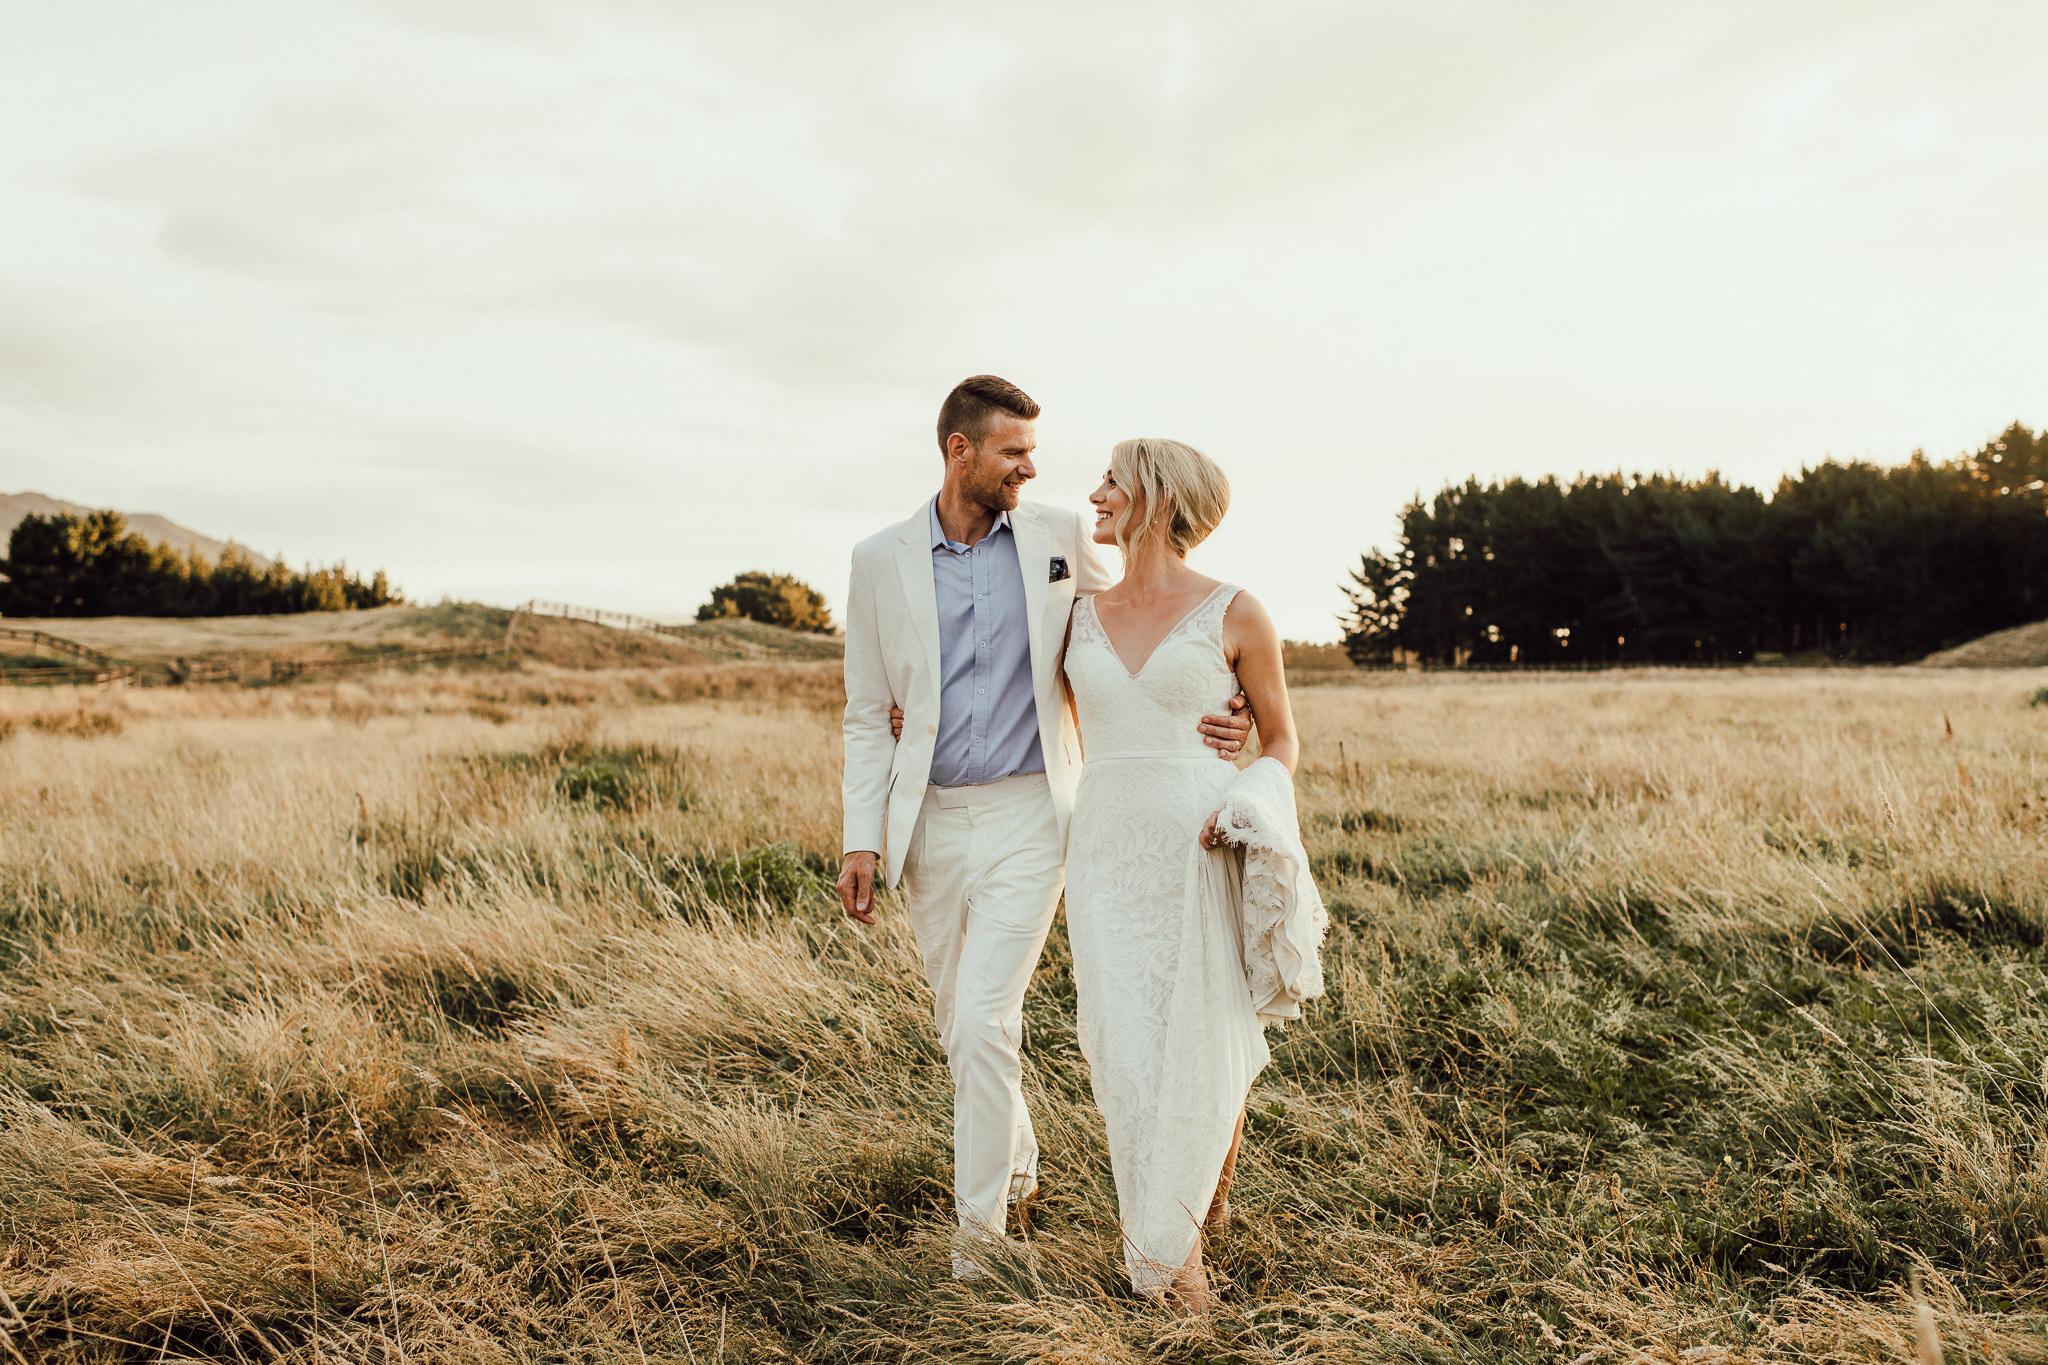 Danielle & John - Wedding Video HighlightsSudbury, WellingtonJanuary 2018